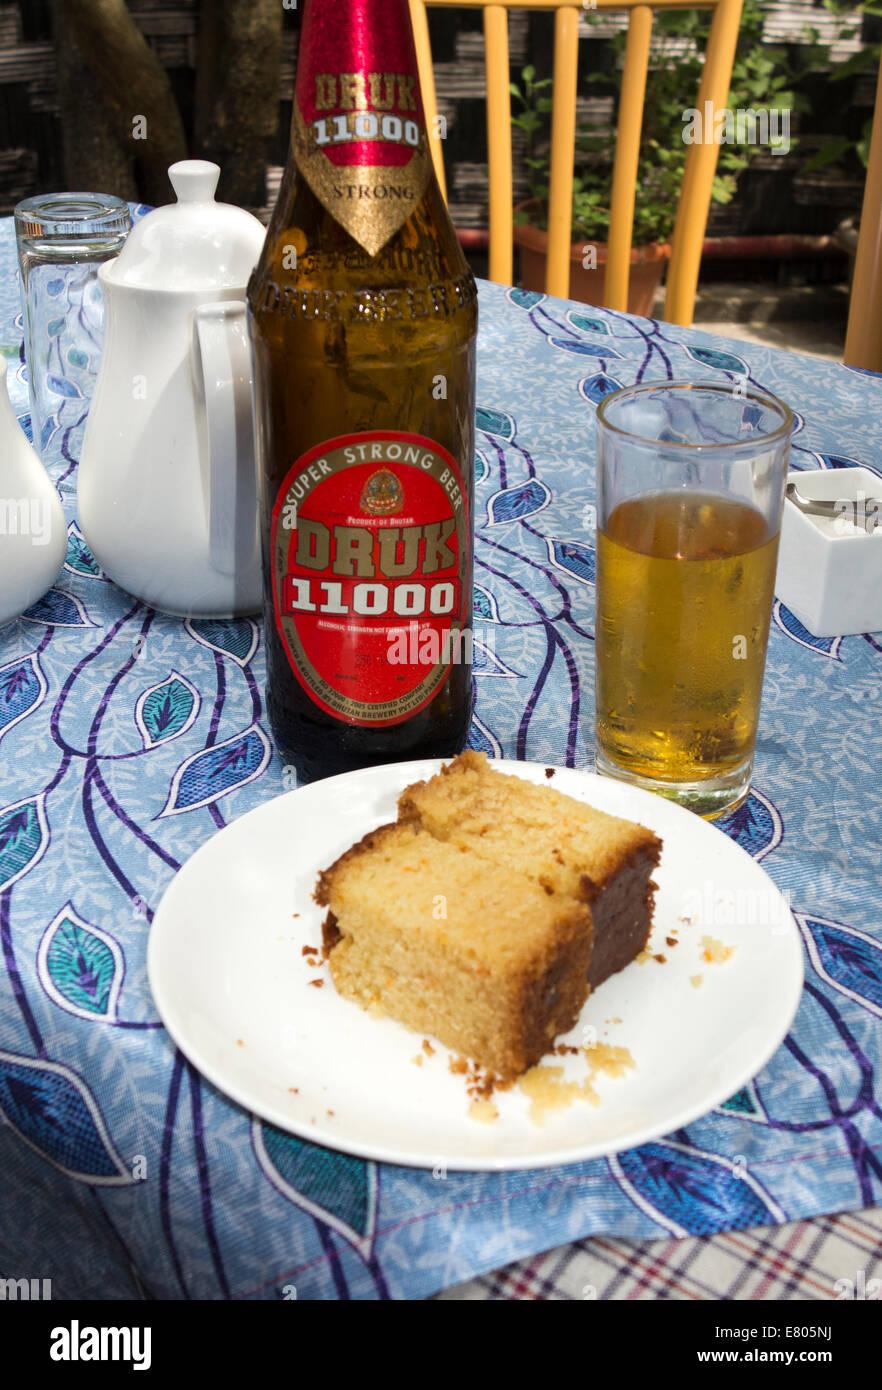 Eastern Bhutan Trashigang Bottle Of Druk 11000 Strong Beer And